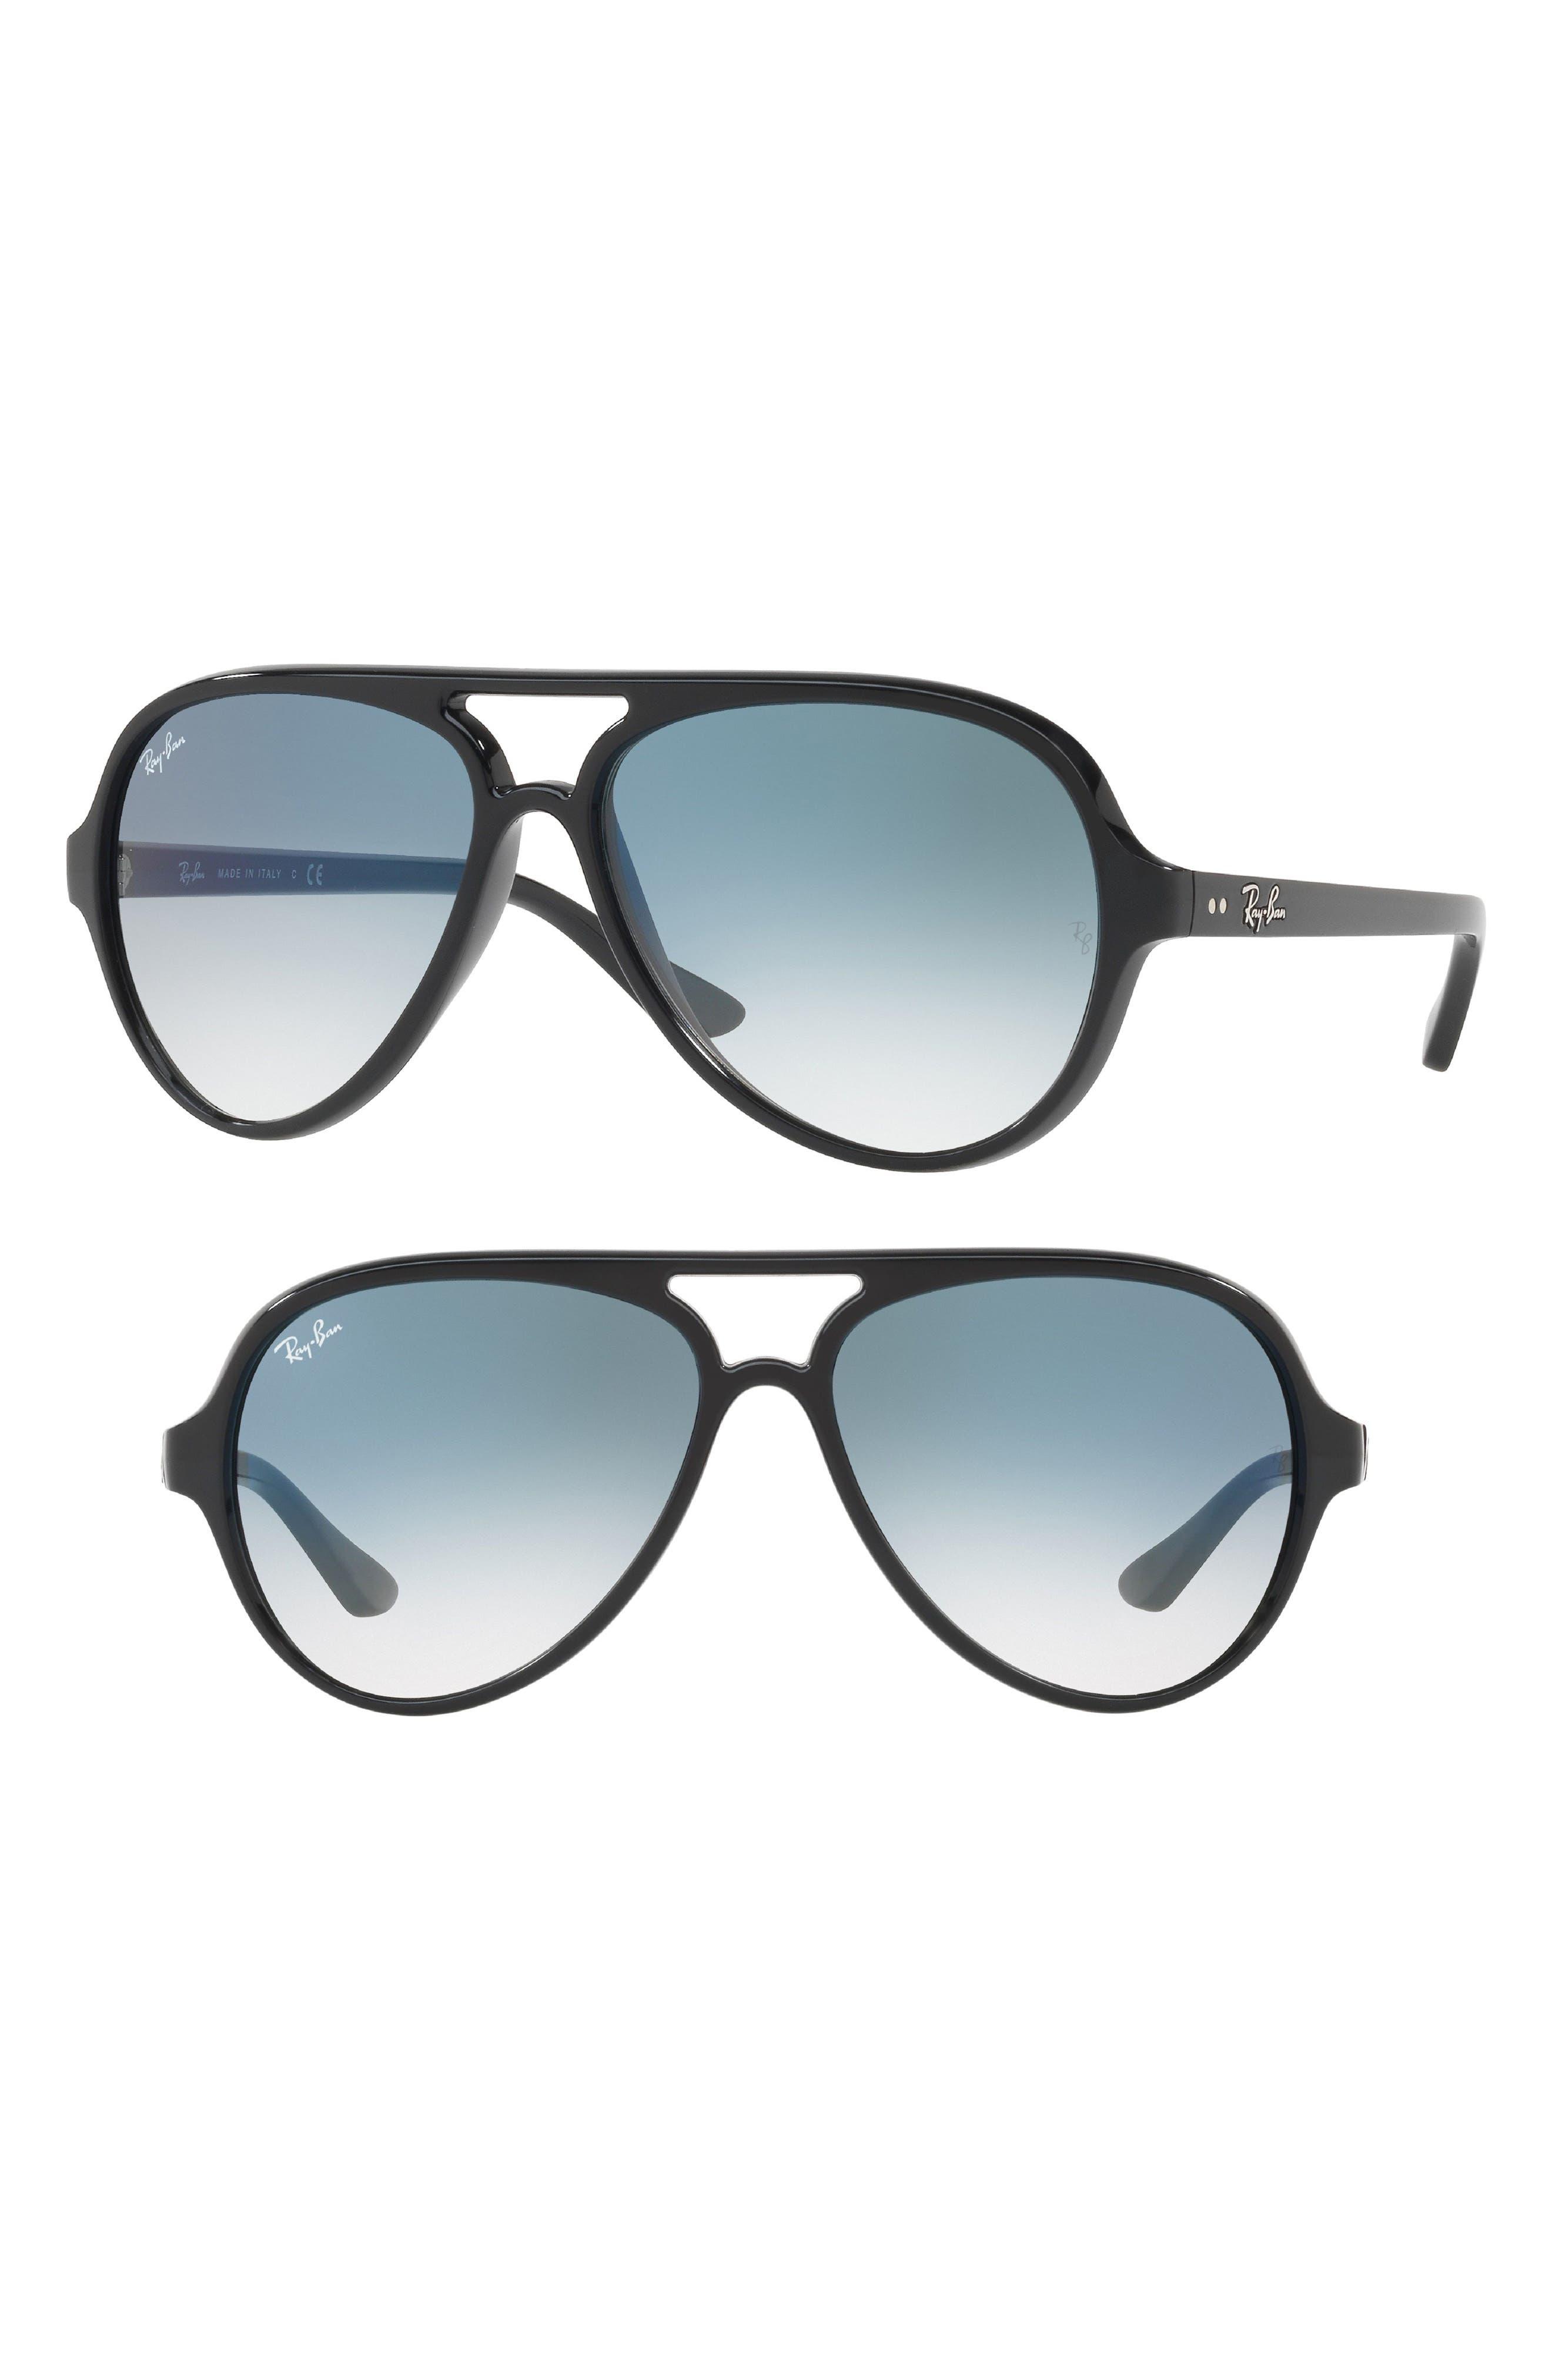 59mm Resin Aviator Sunglasses,                             Main thumbnail 1, color,                             003